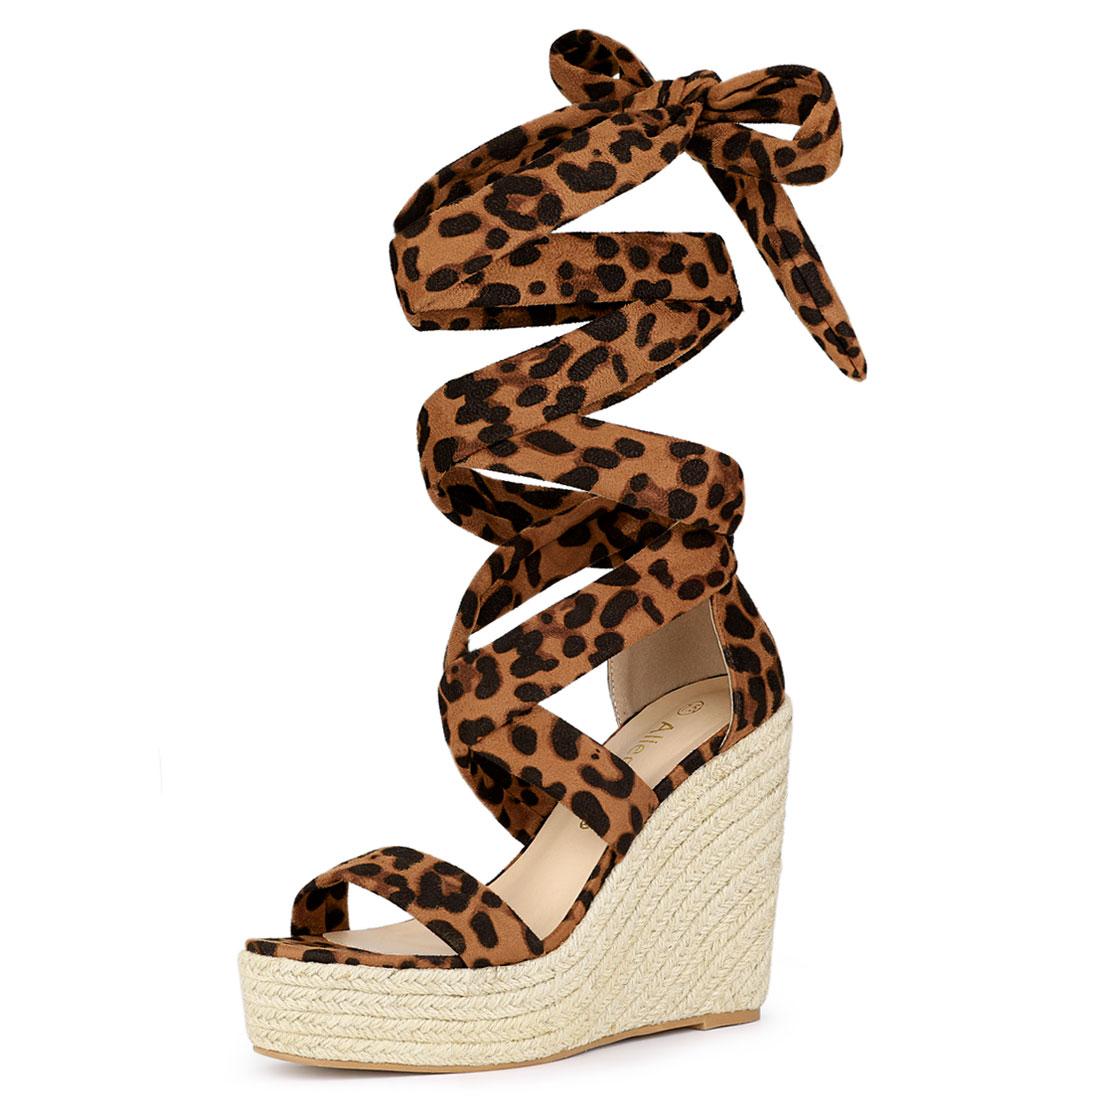 Allegra K Women's Espadrille Platform Wedges Heel Lace Up Sandals Leopard US 9